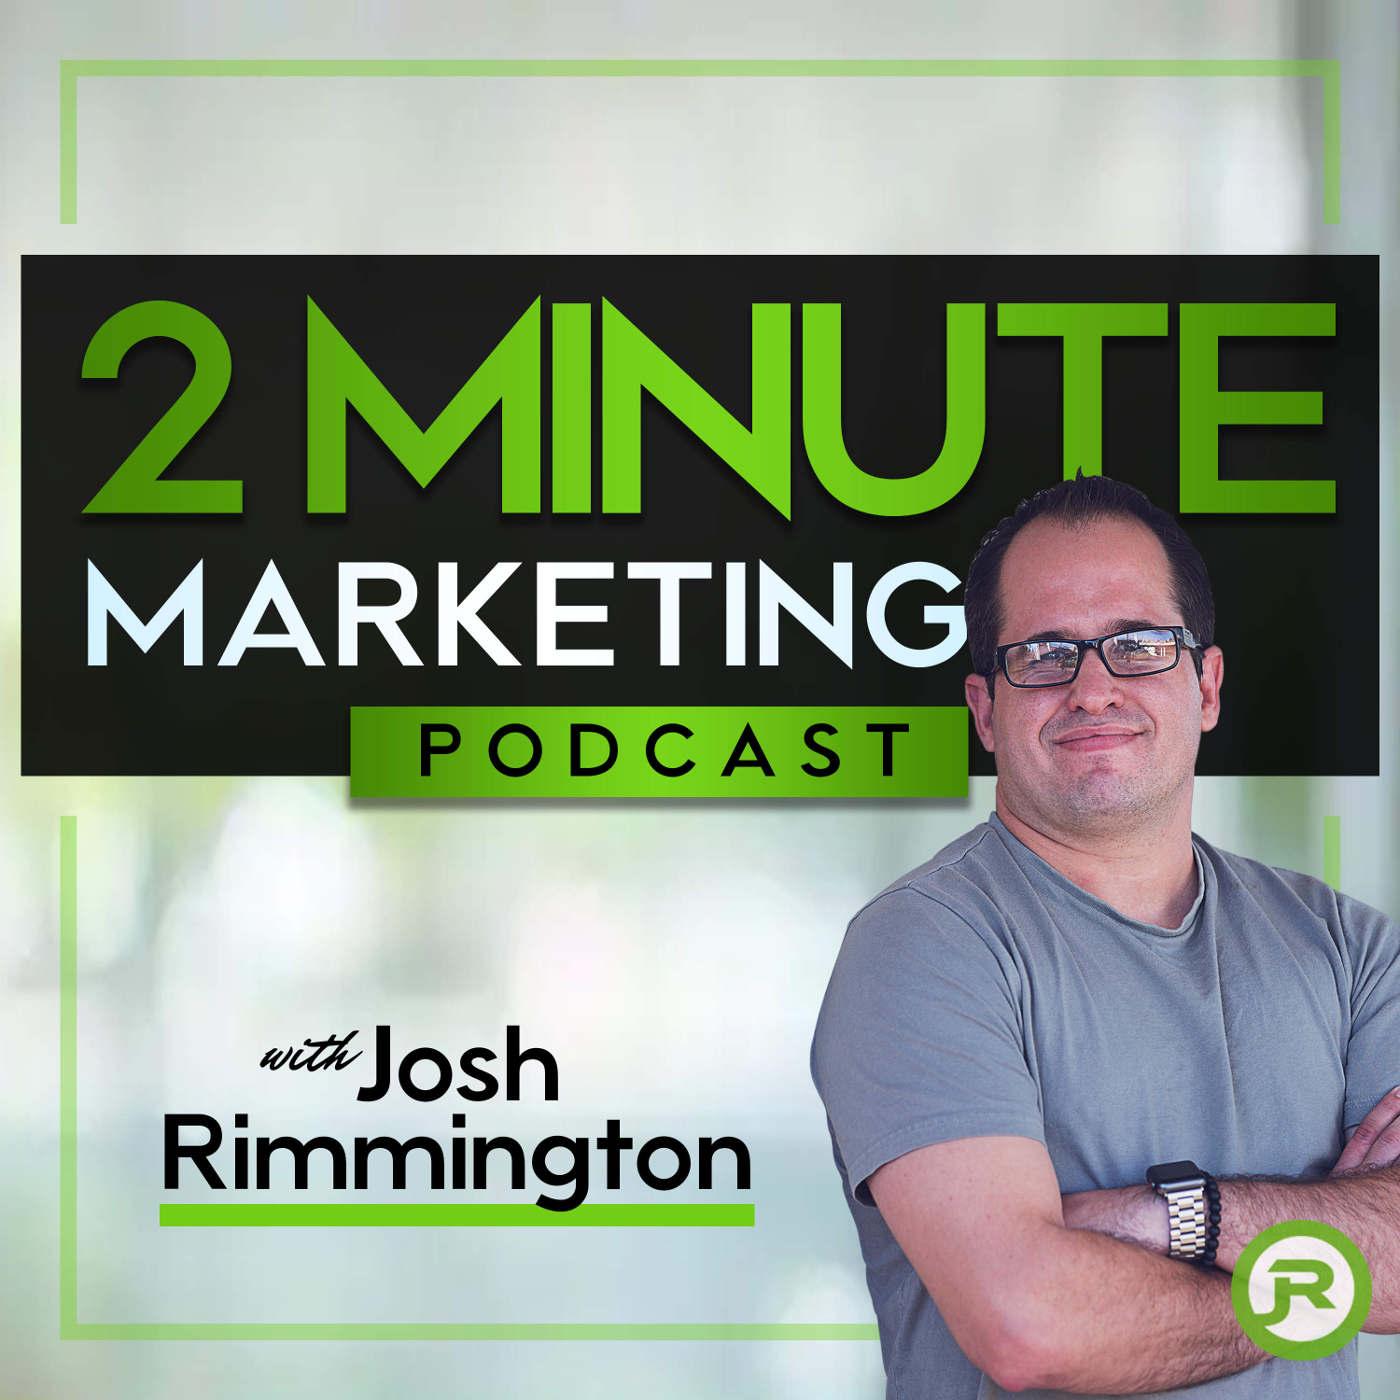 2 Minute Marketing Podcast show art